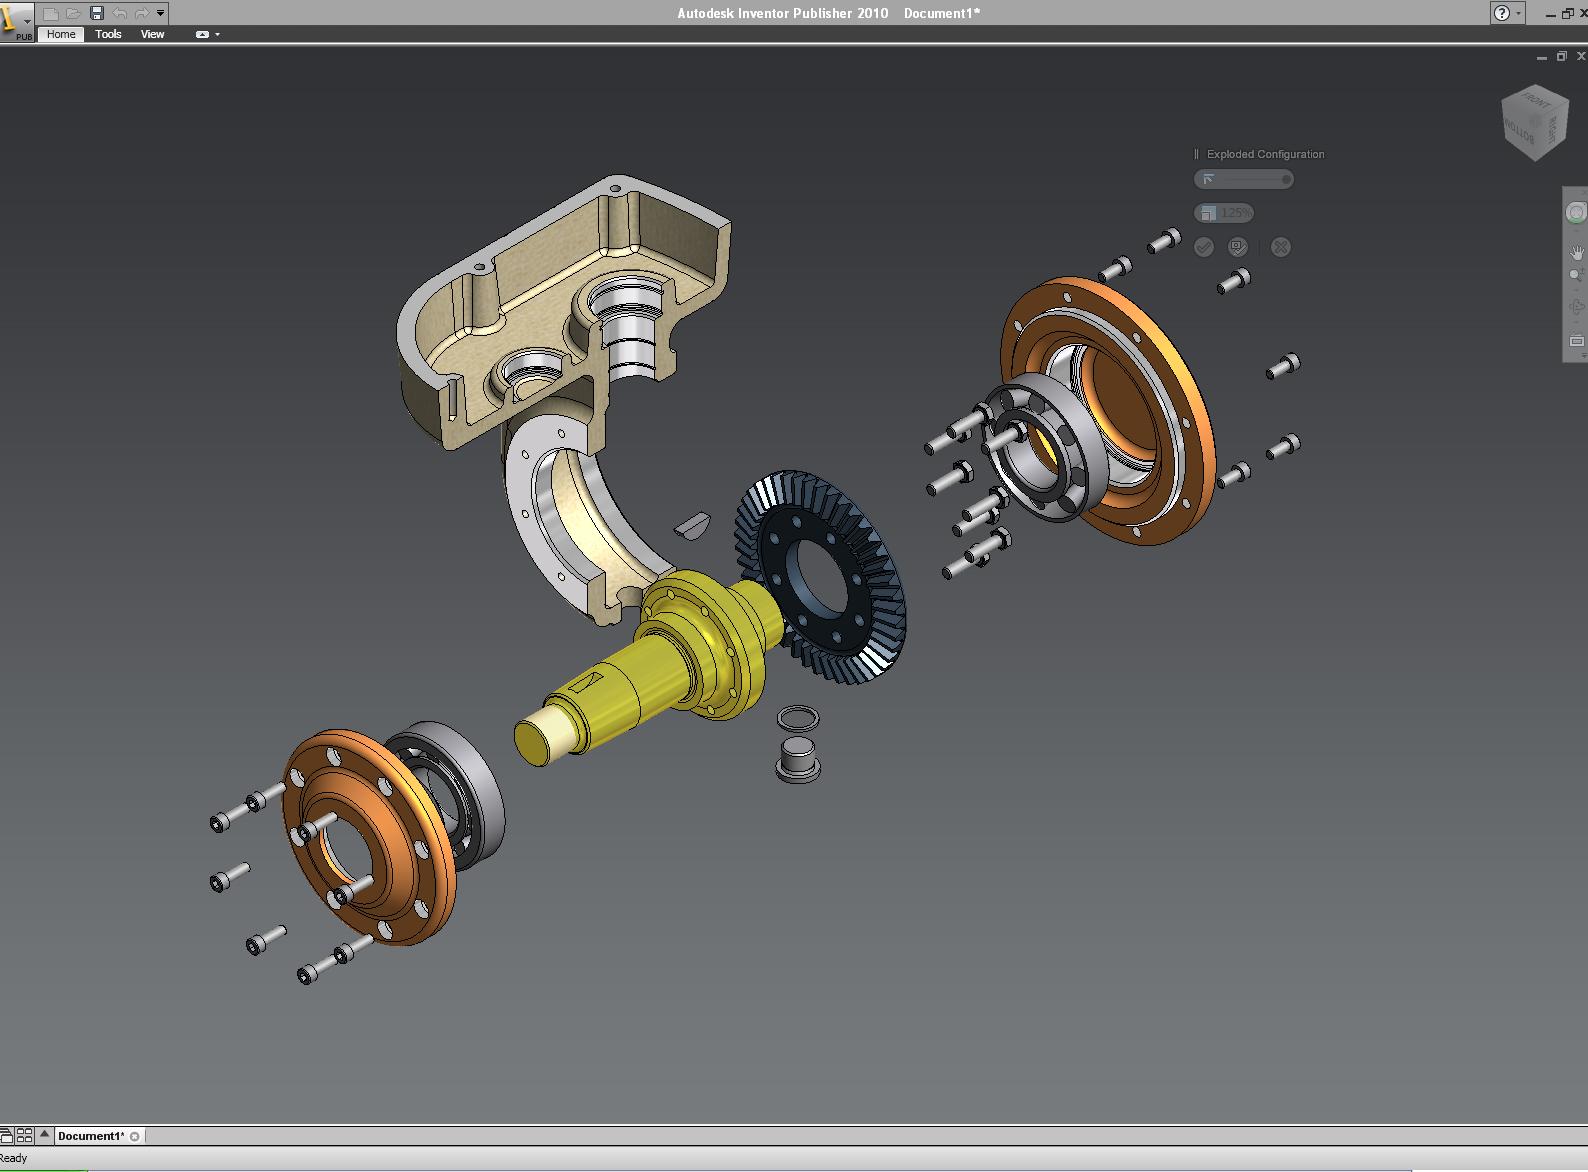 http://www.ikiteknik.com/upload/image/Inventor_5.png